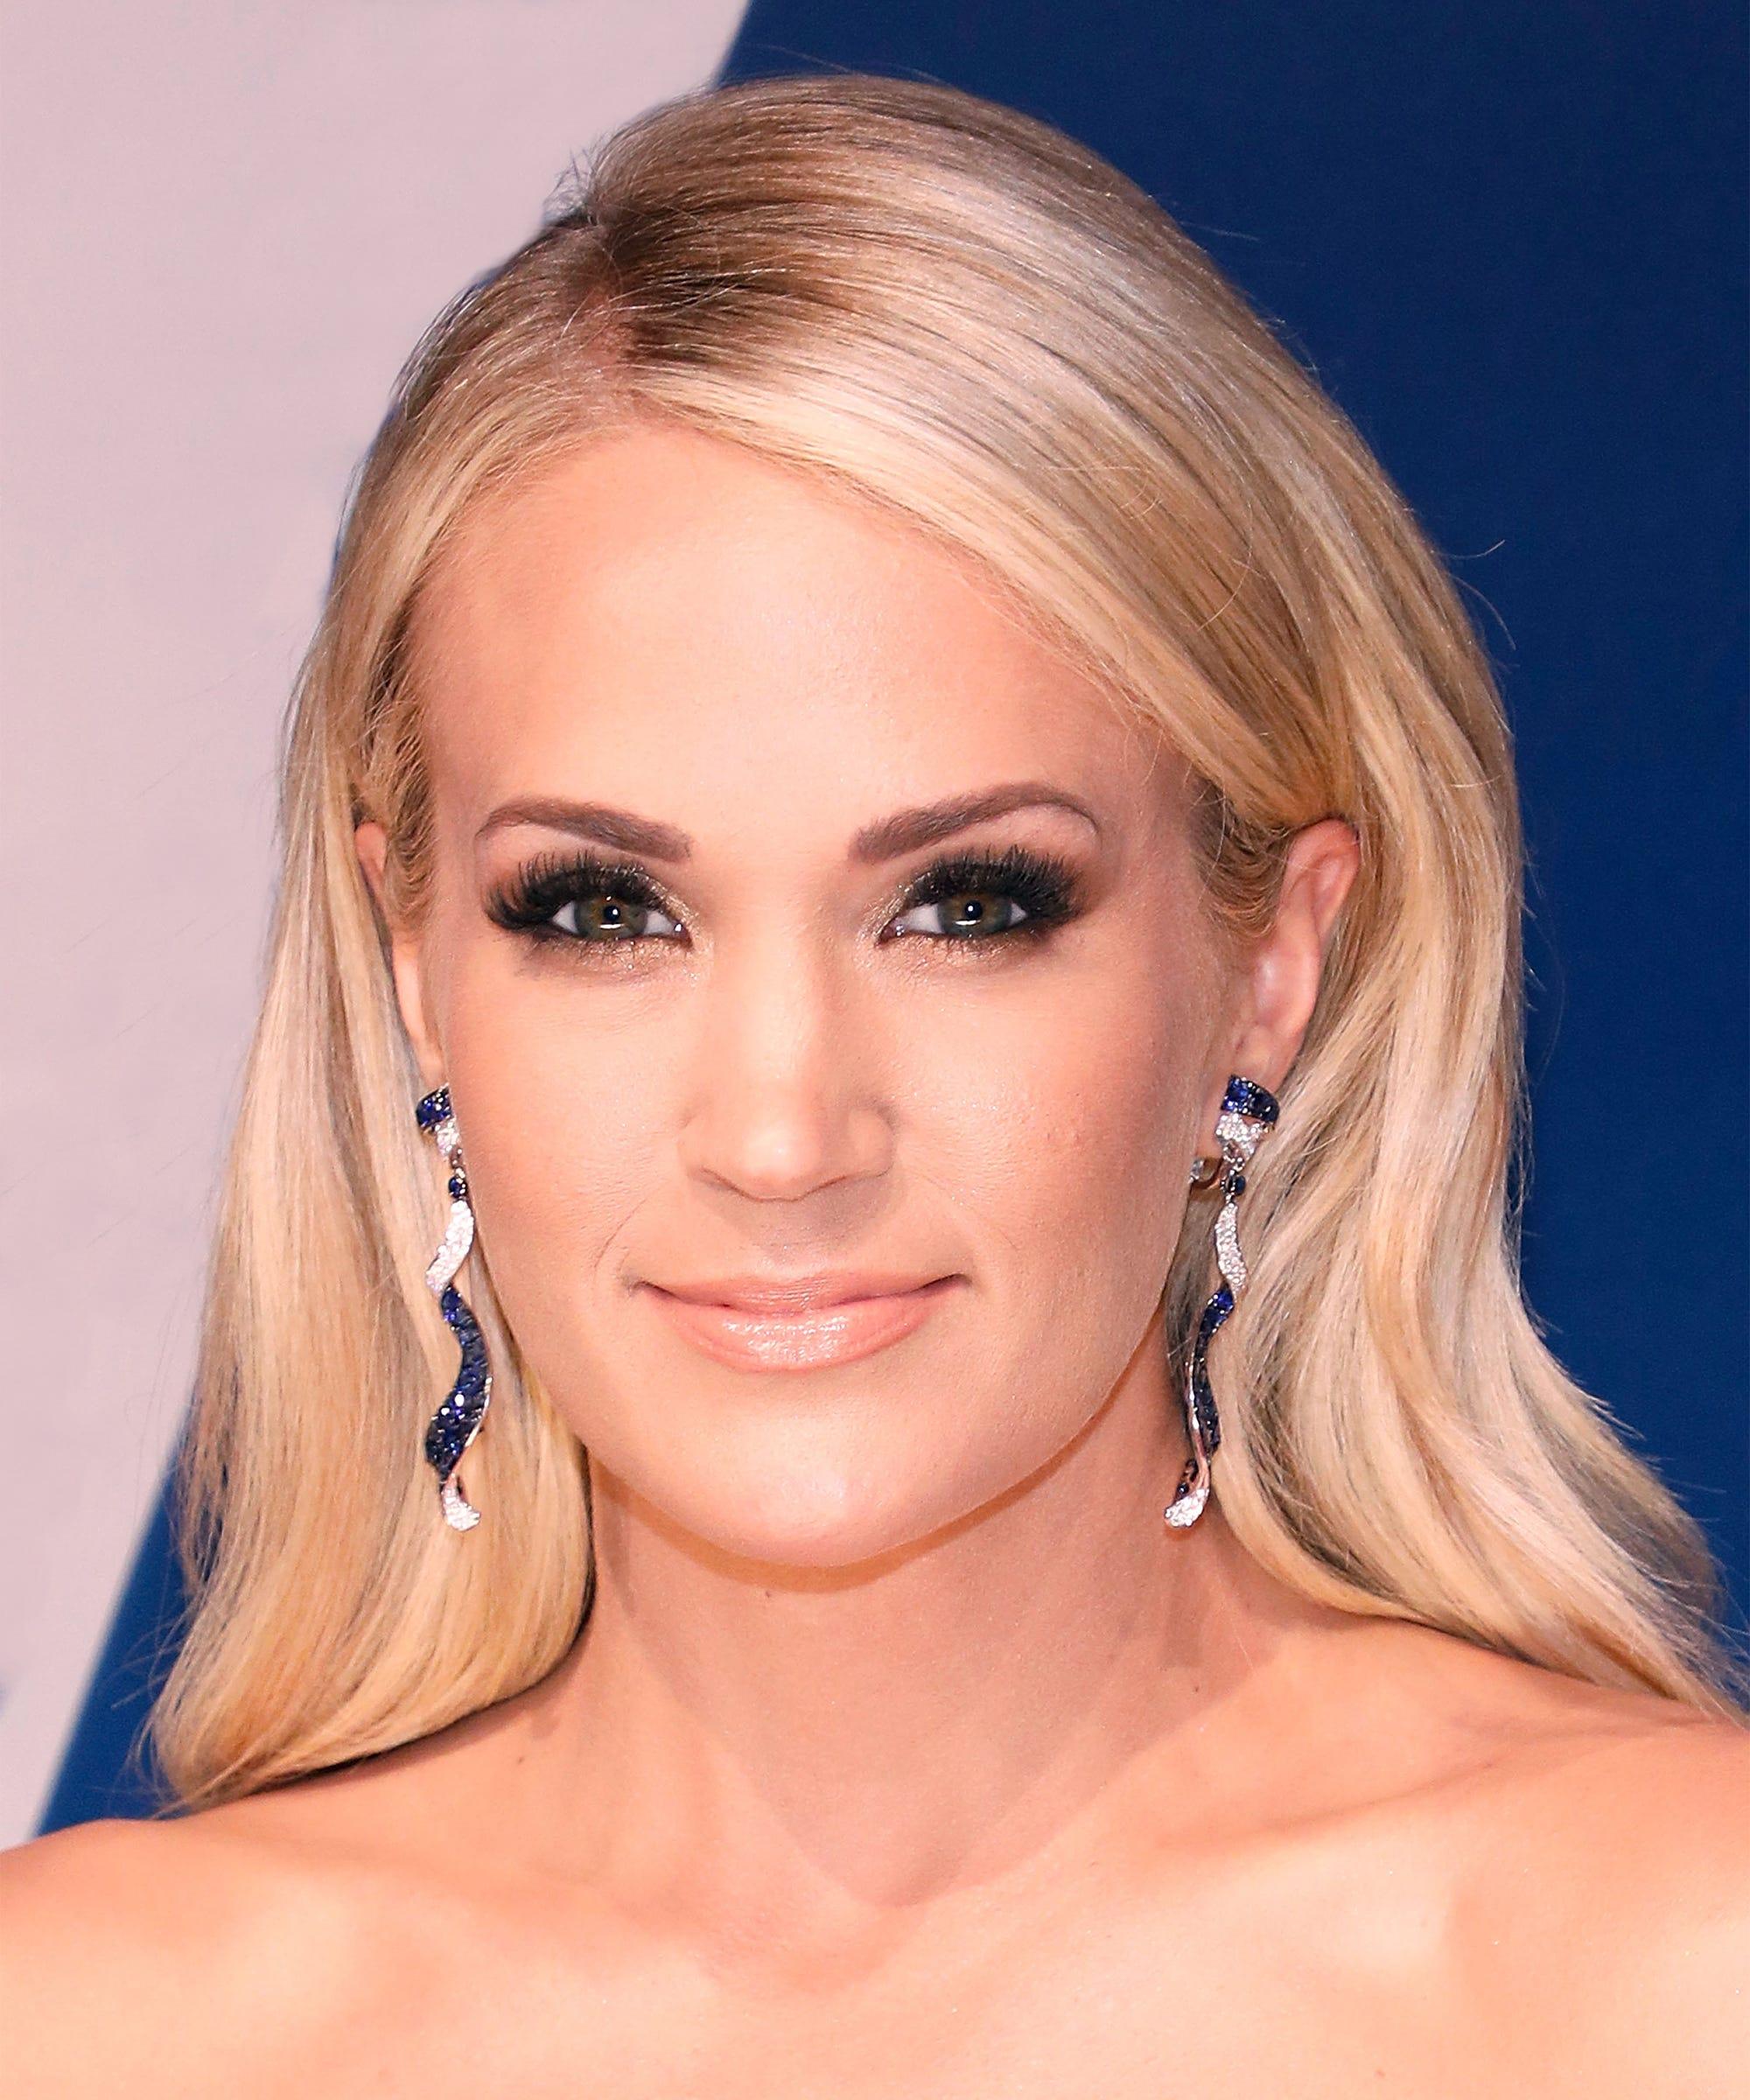 Carrie Underwood Full Sex Tape